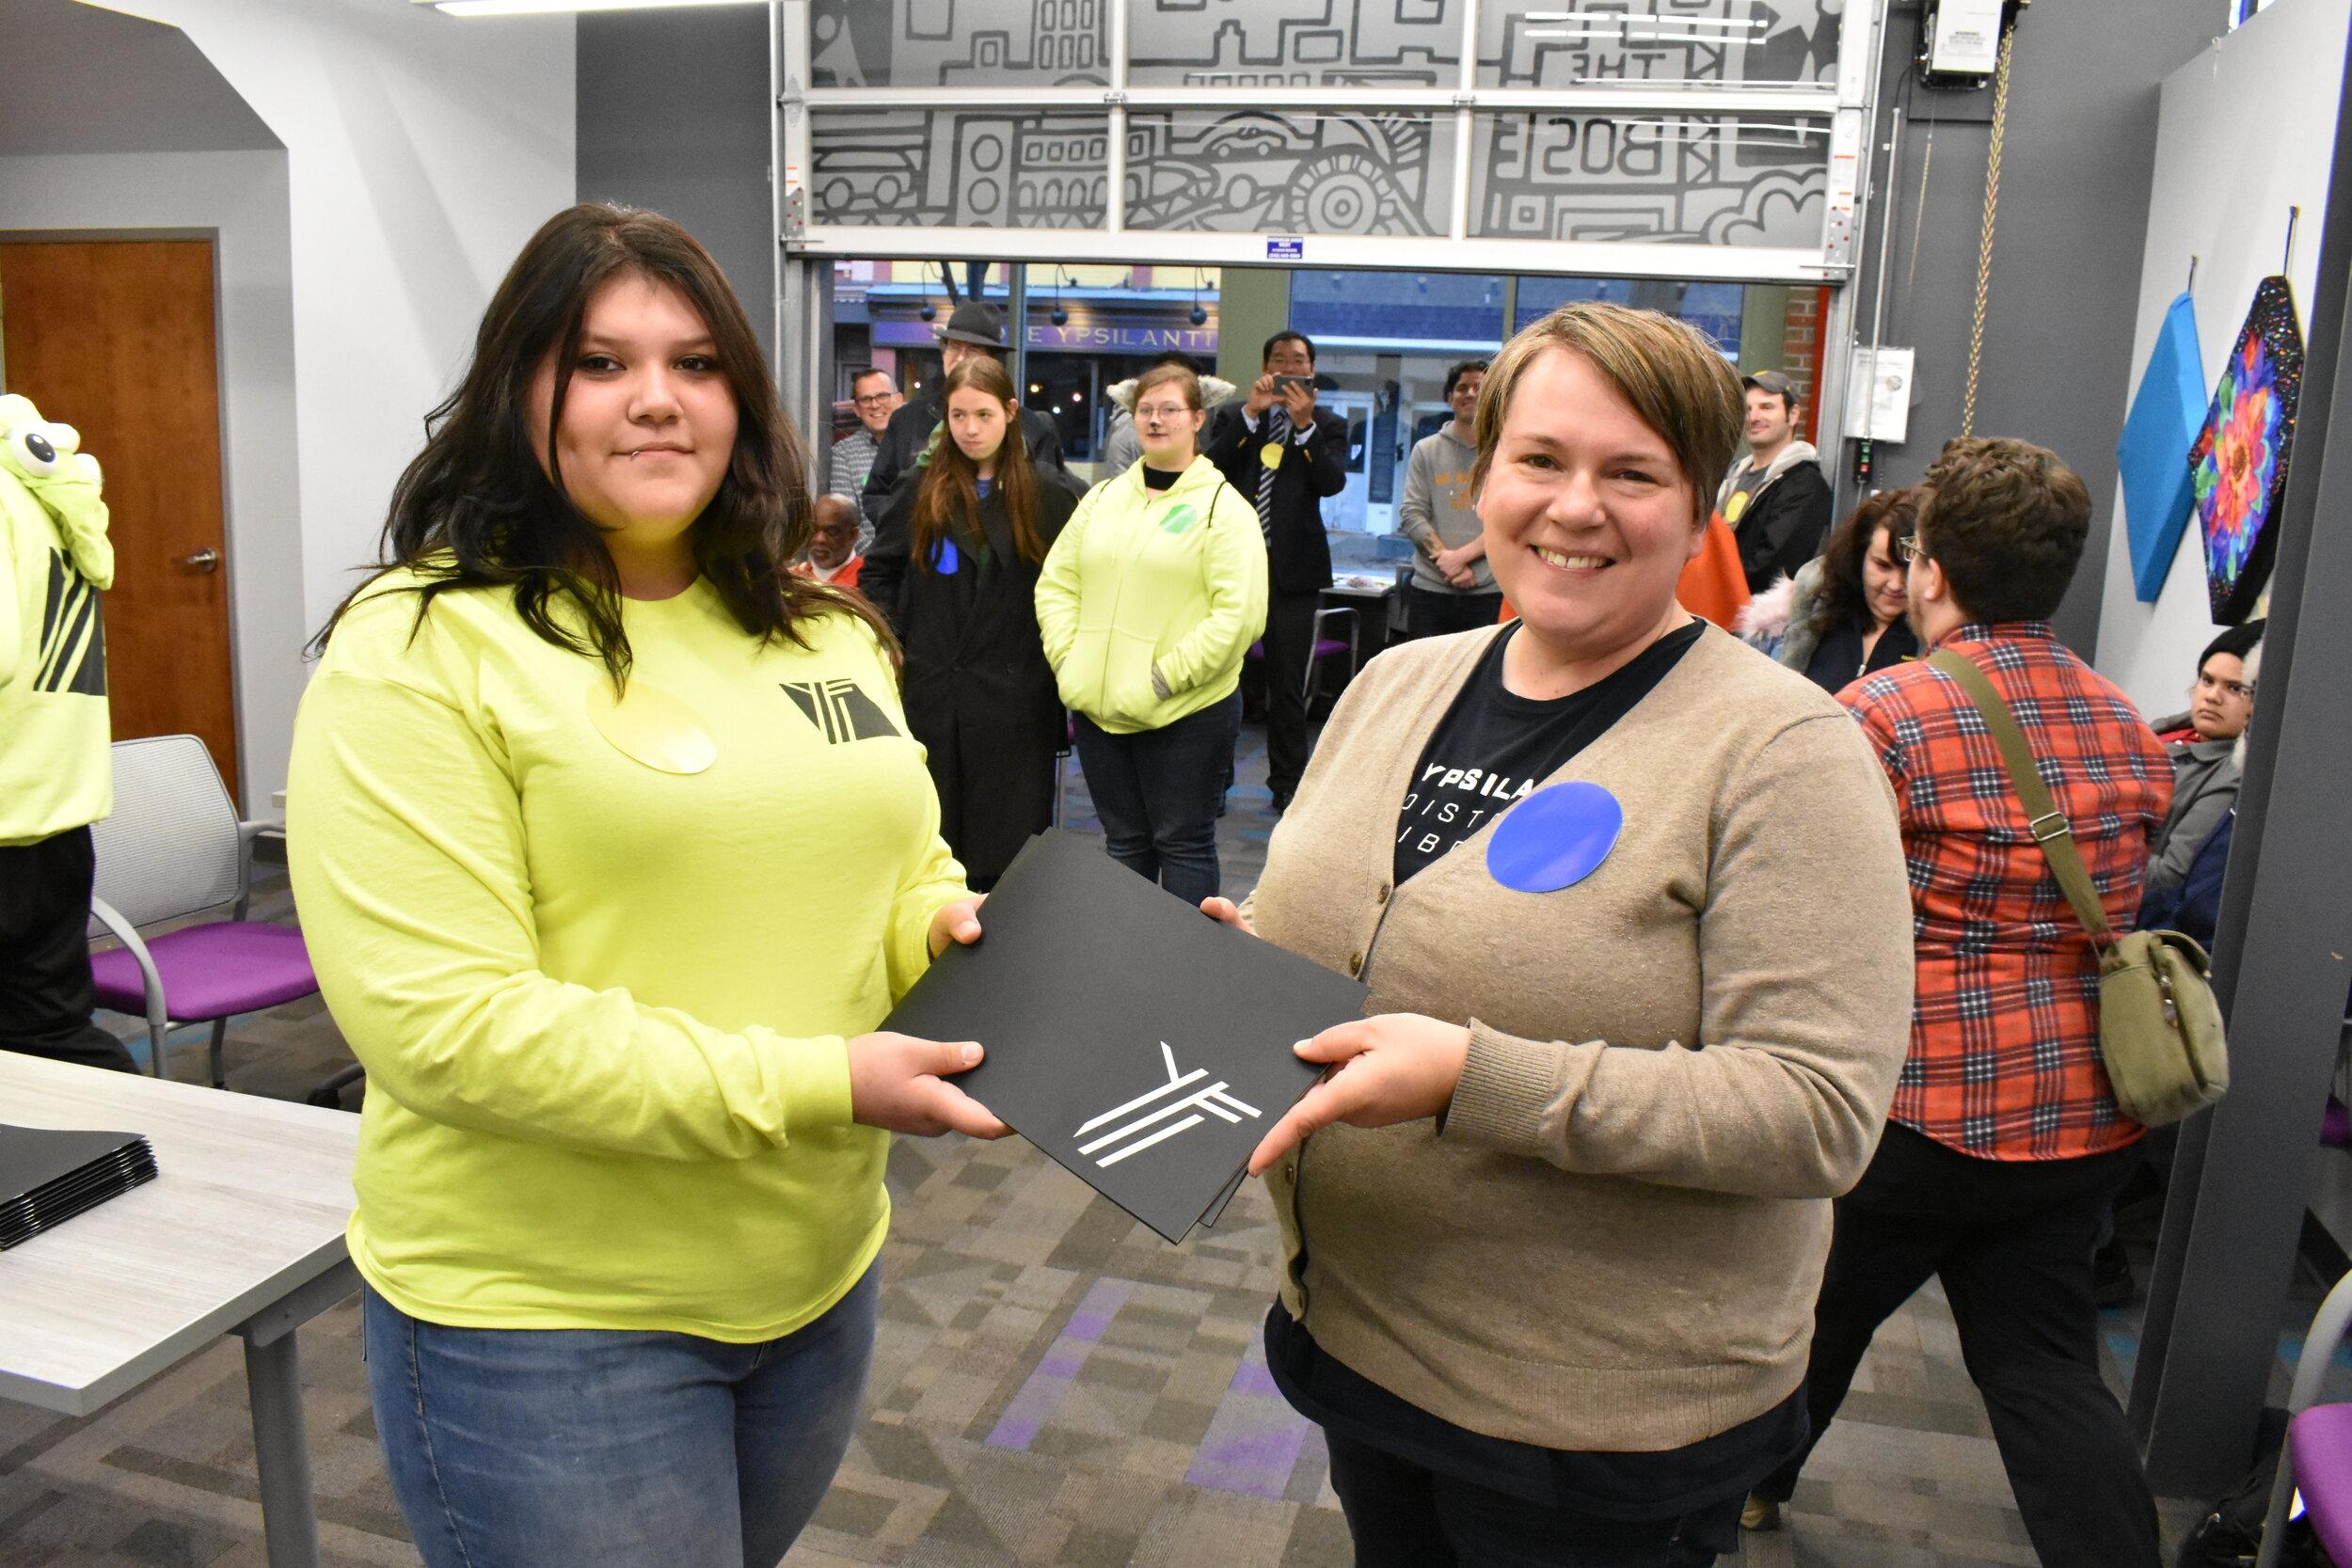 YFi presents commemorative book to Ypsilanti District Library